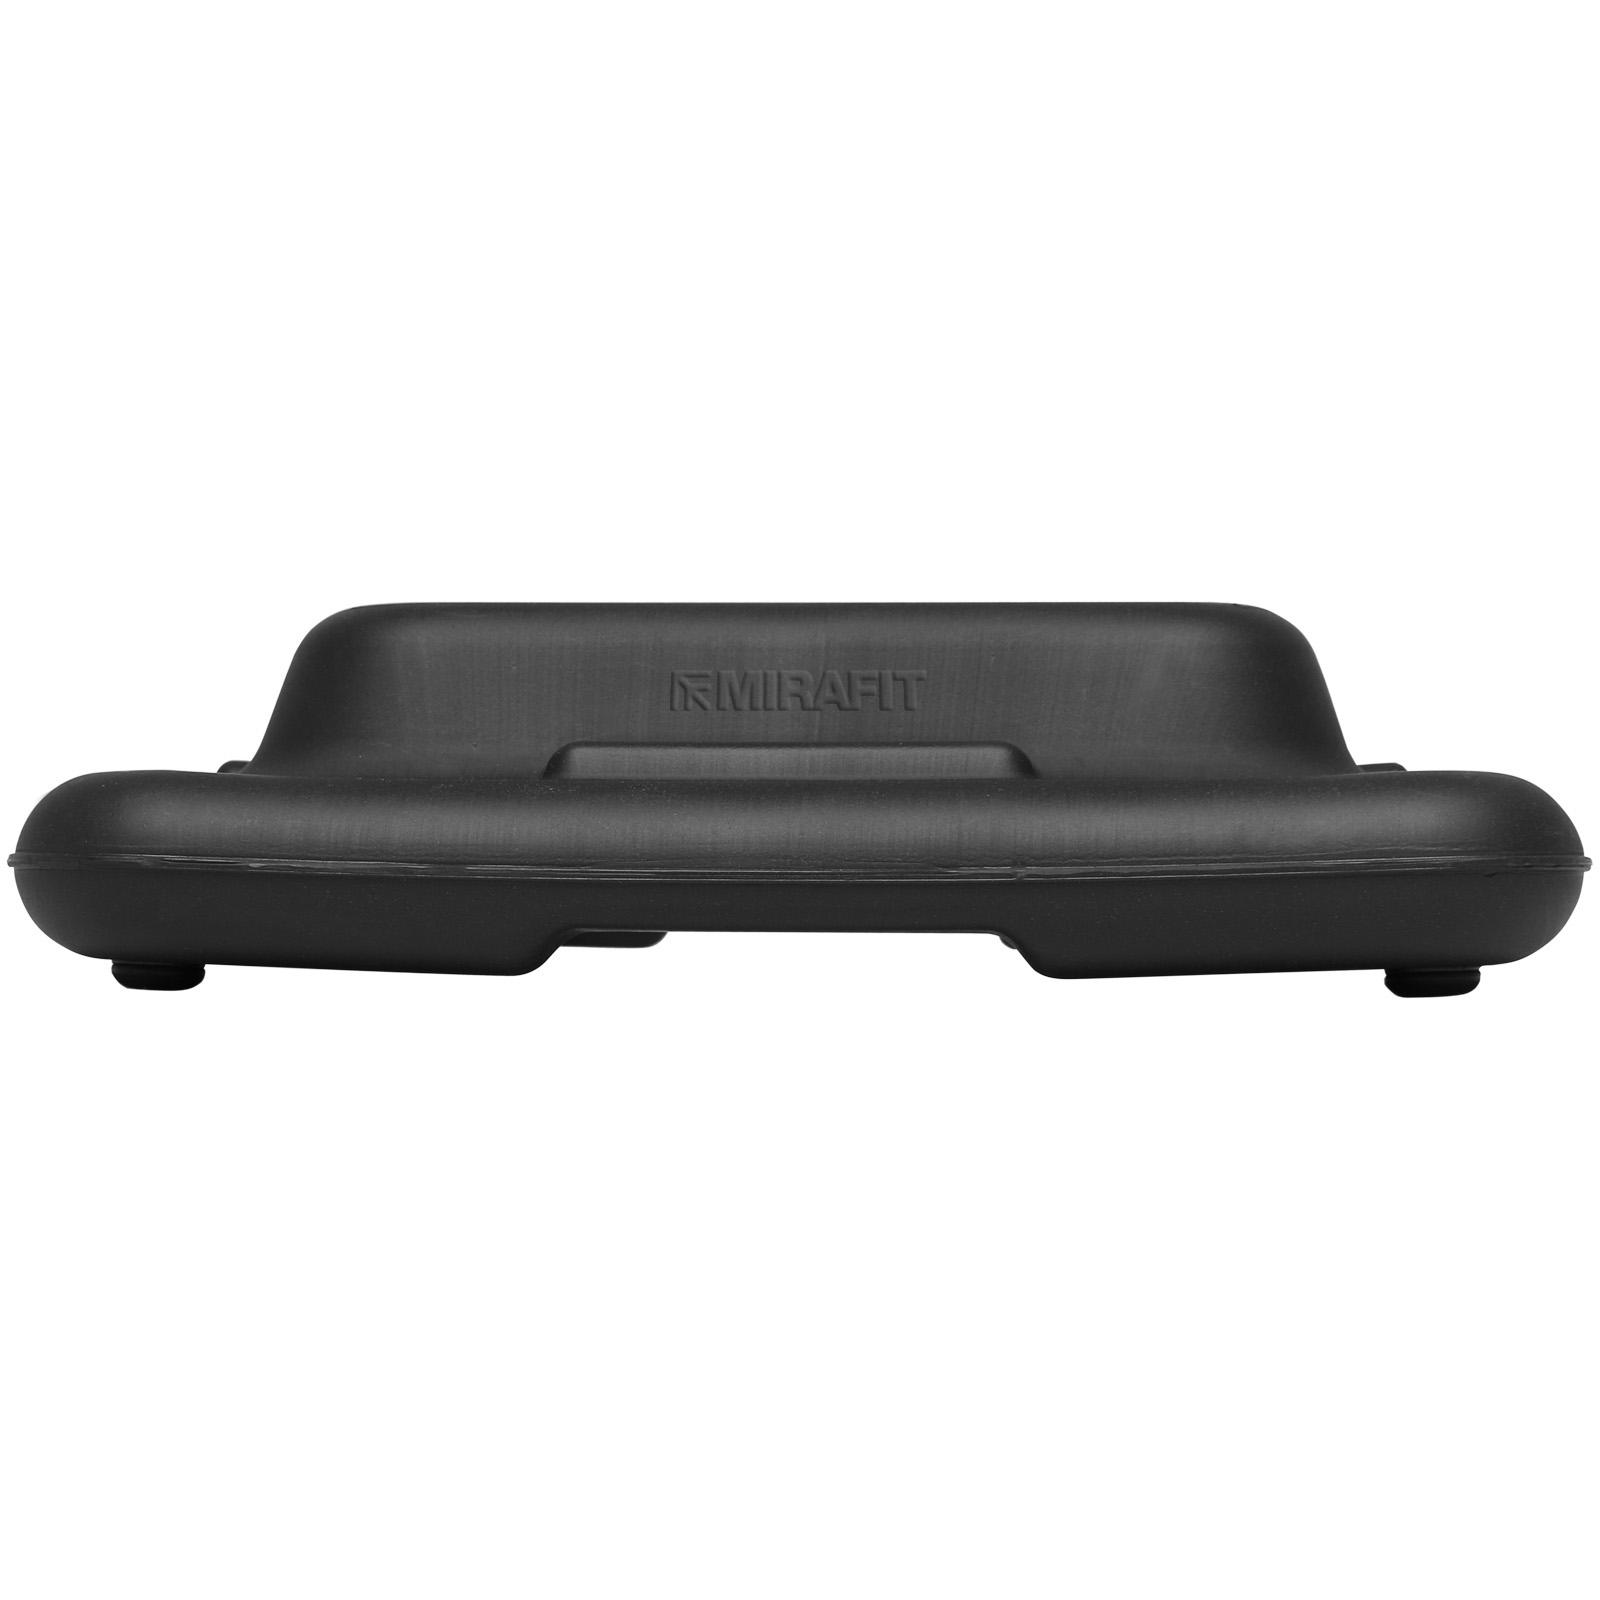 MIRAFIT Aerobic Step Platform/Board Extra Raiser Blocks